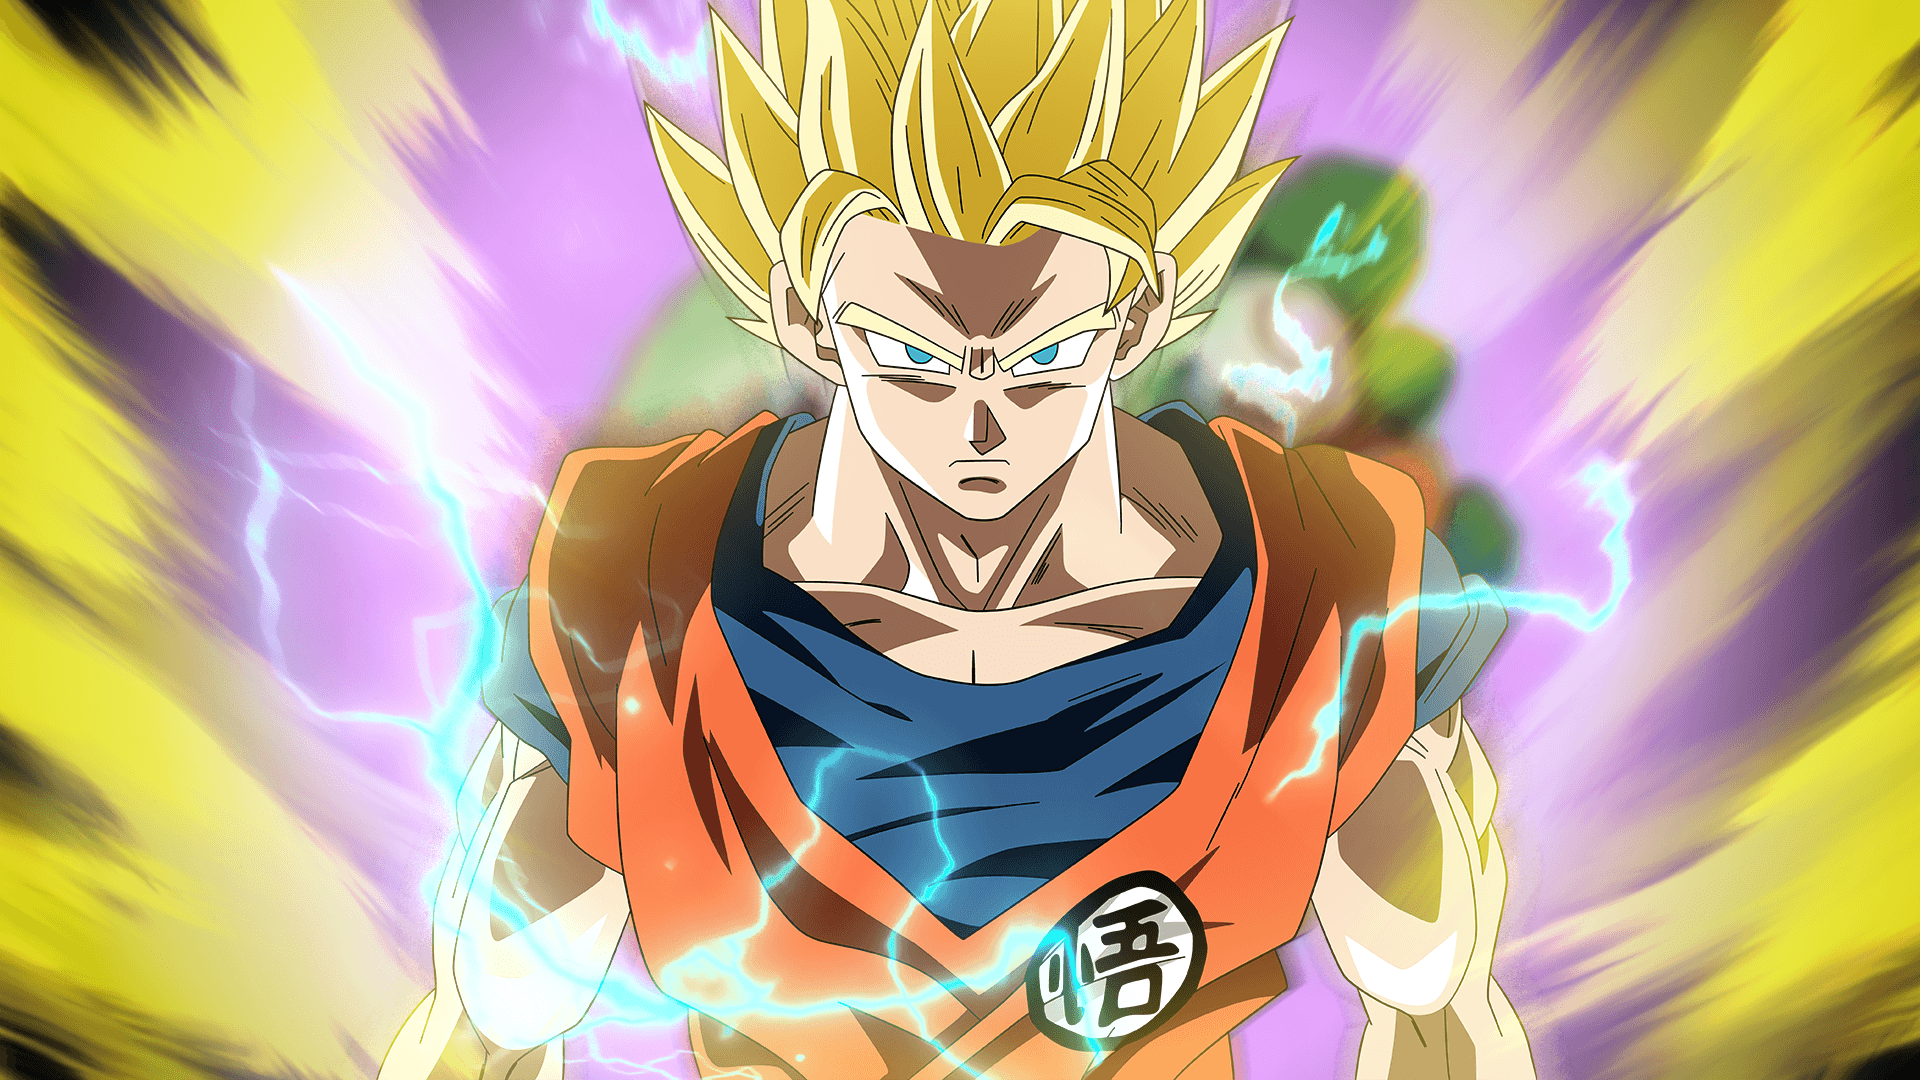 Super Saiyan Goku Wallpapers Group 91